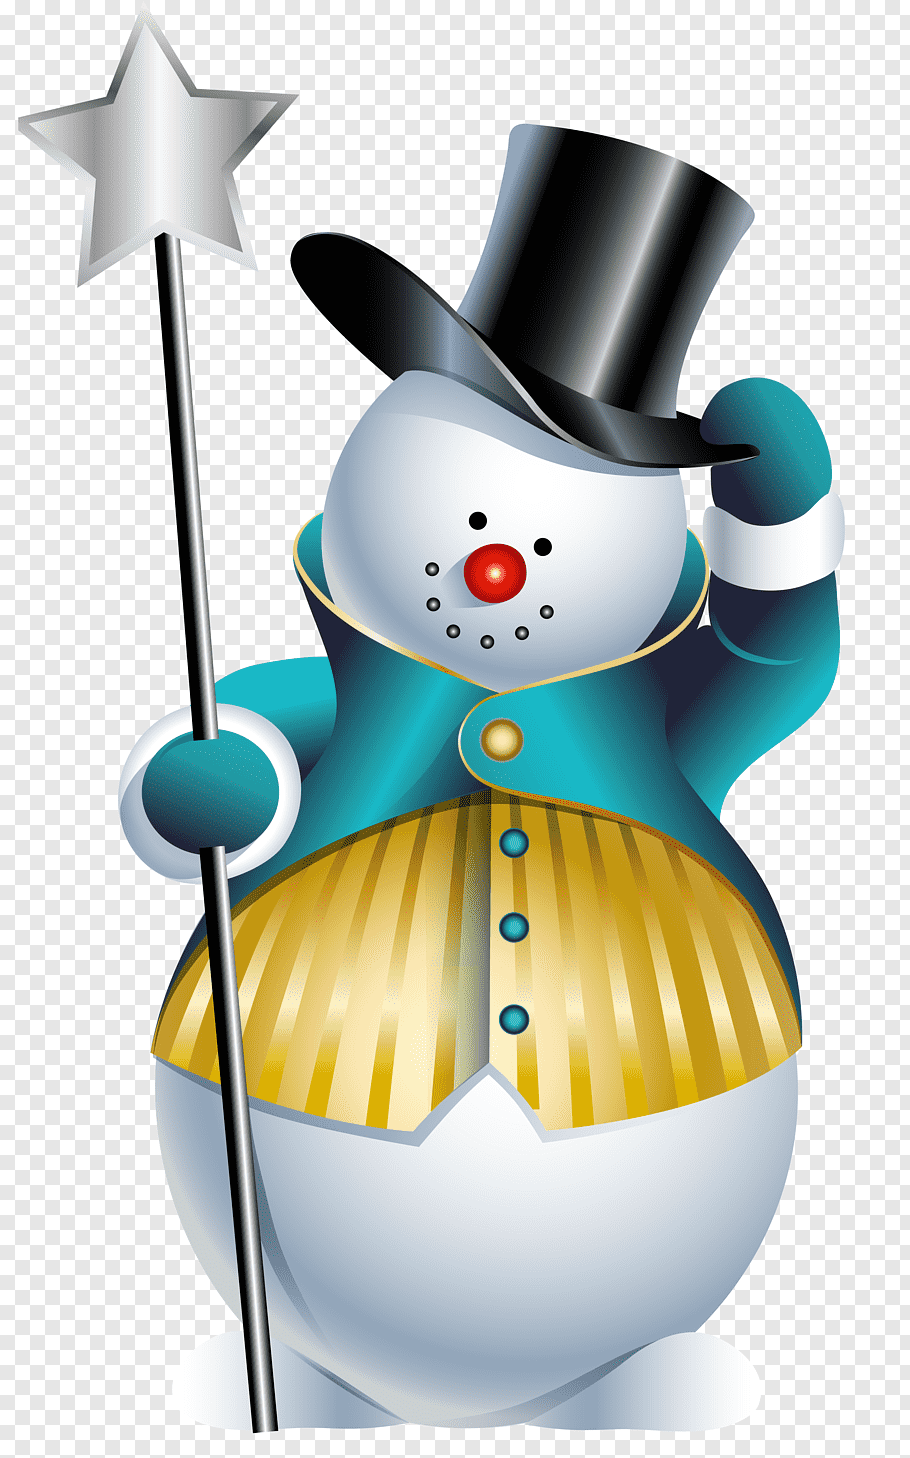 Snowman Holding Star Stick Illustration Snowman Cute Snowman Free Png Snowman Clipart Christmas Art Christmas Drawing